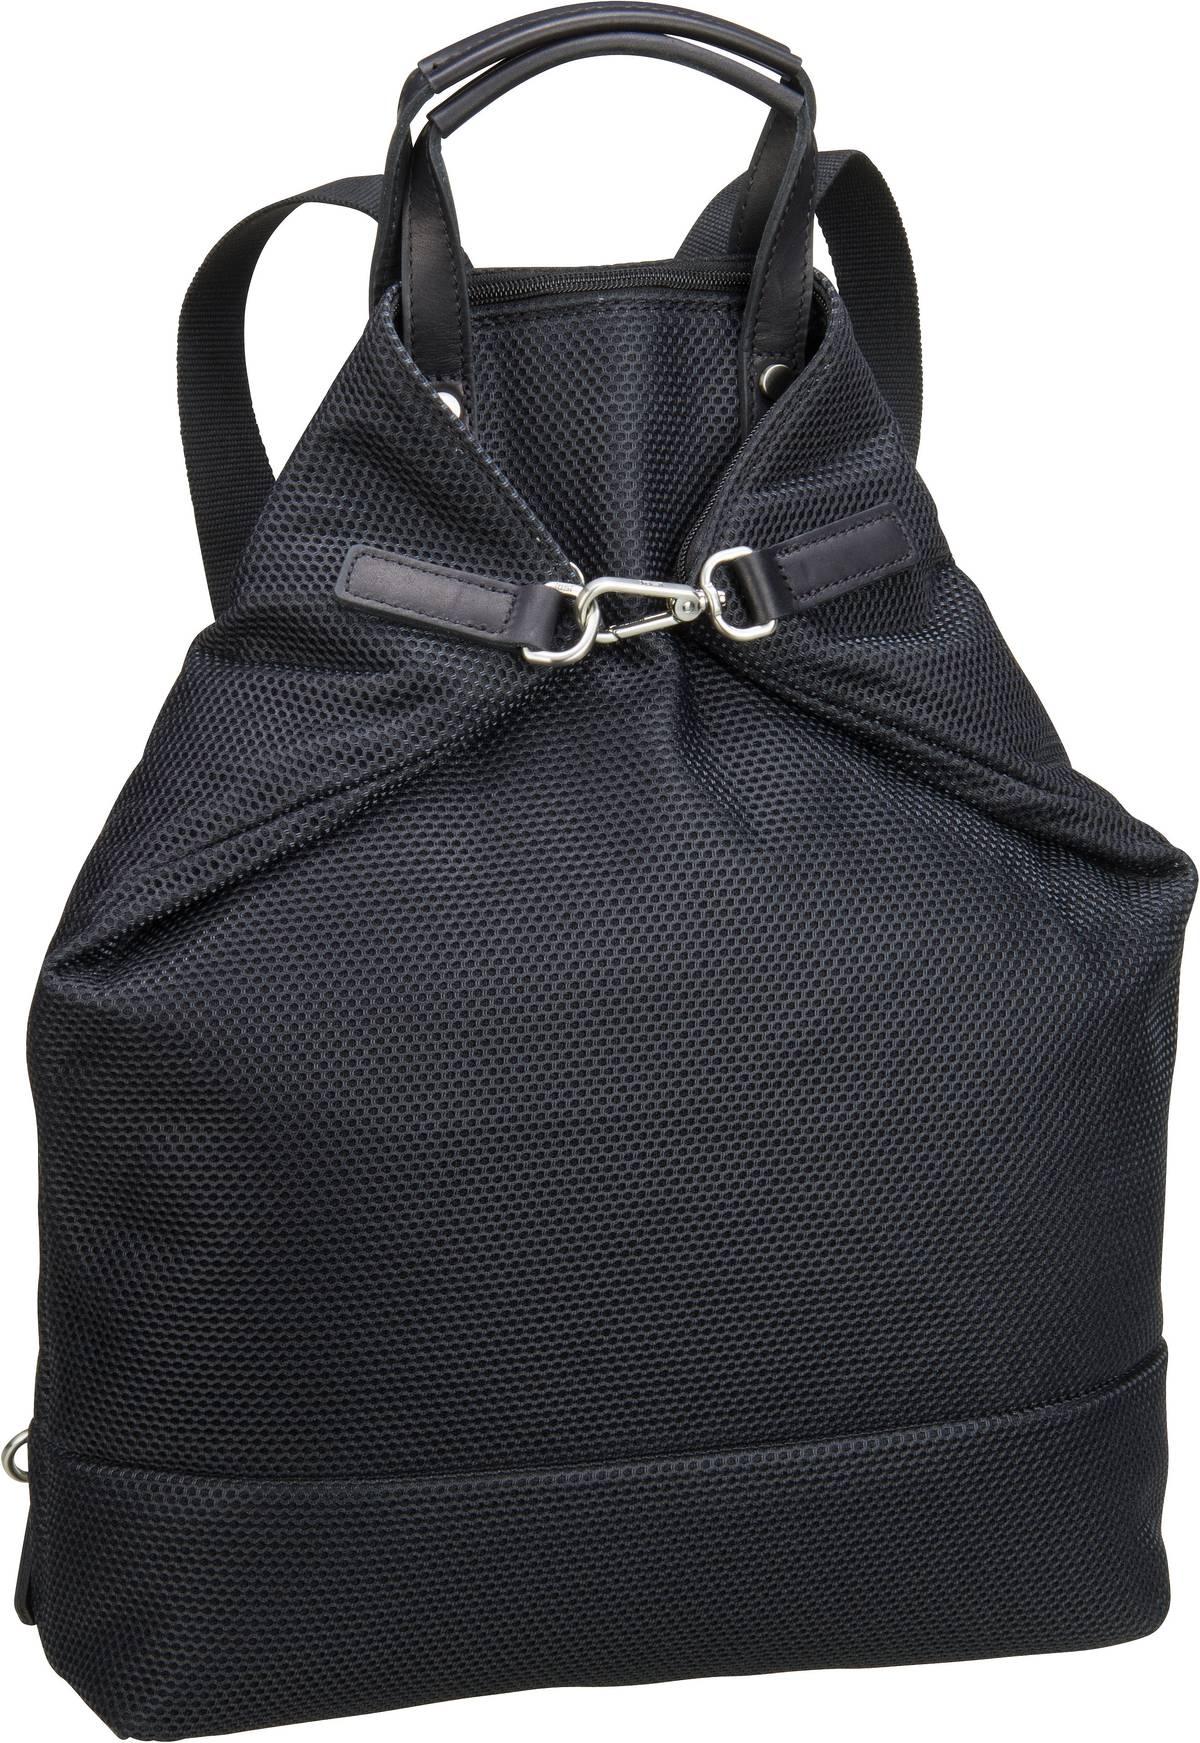 Rucksack / Daypack Mesh 6170 X-Change 3in1 Bag M Black